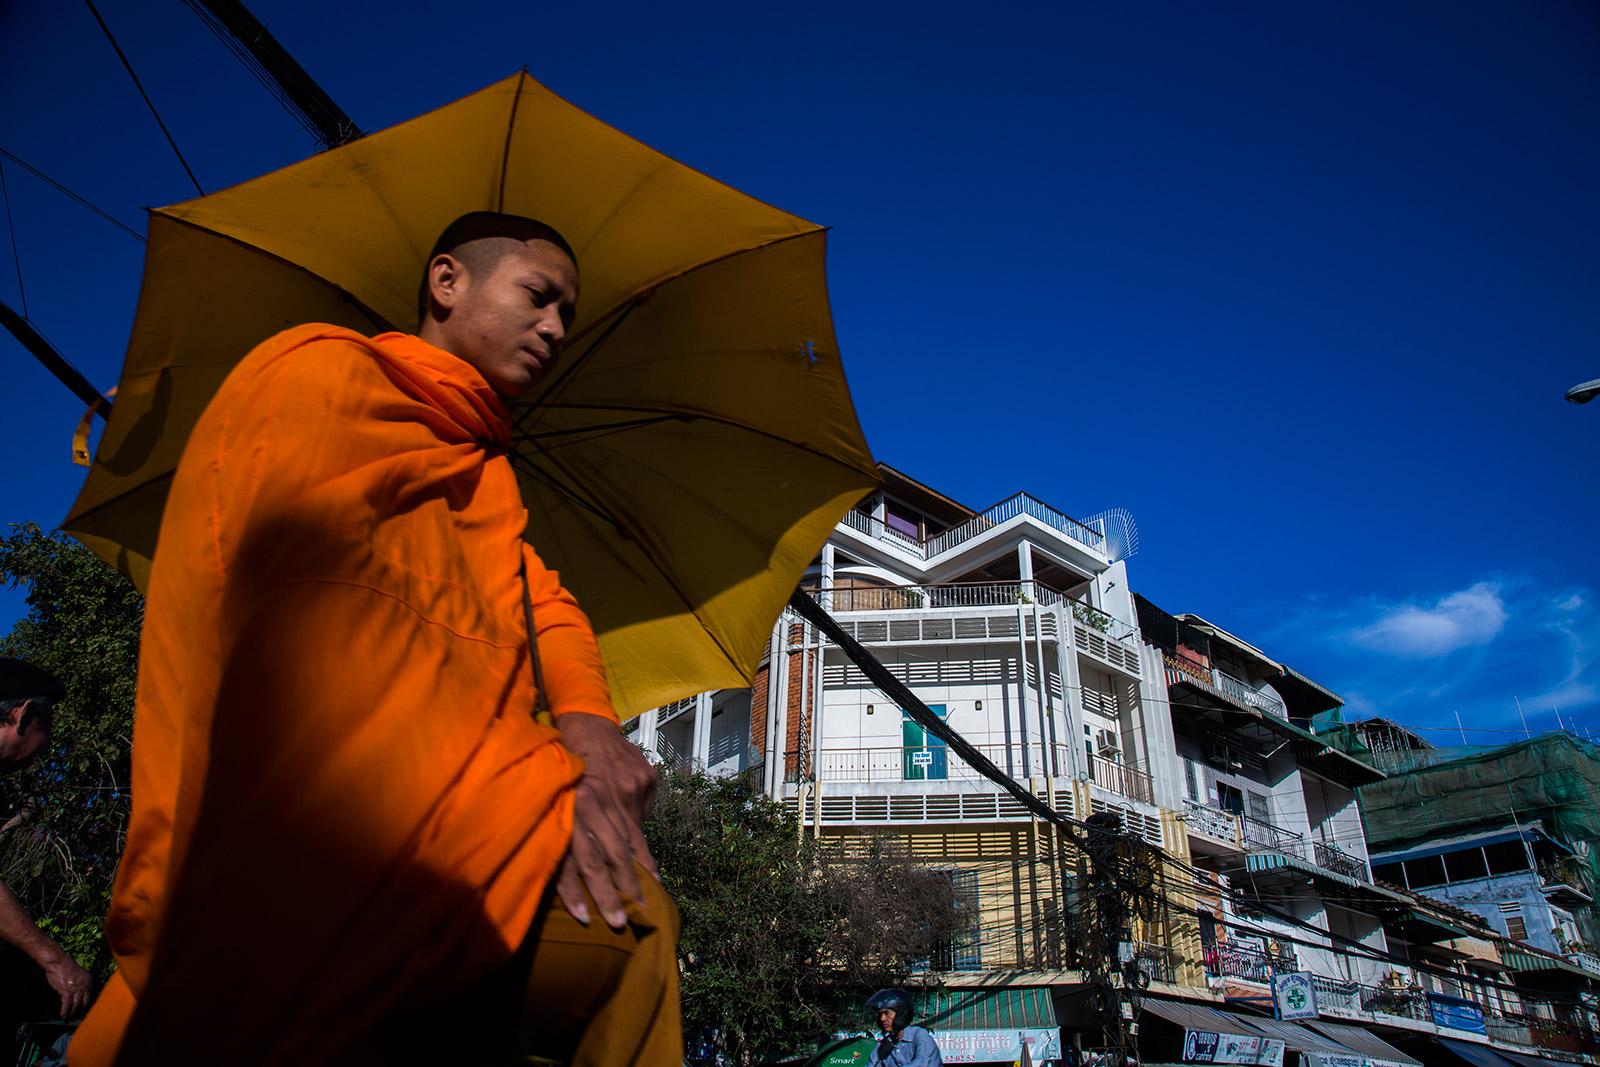 phnom-penh-street-0001.jpg